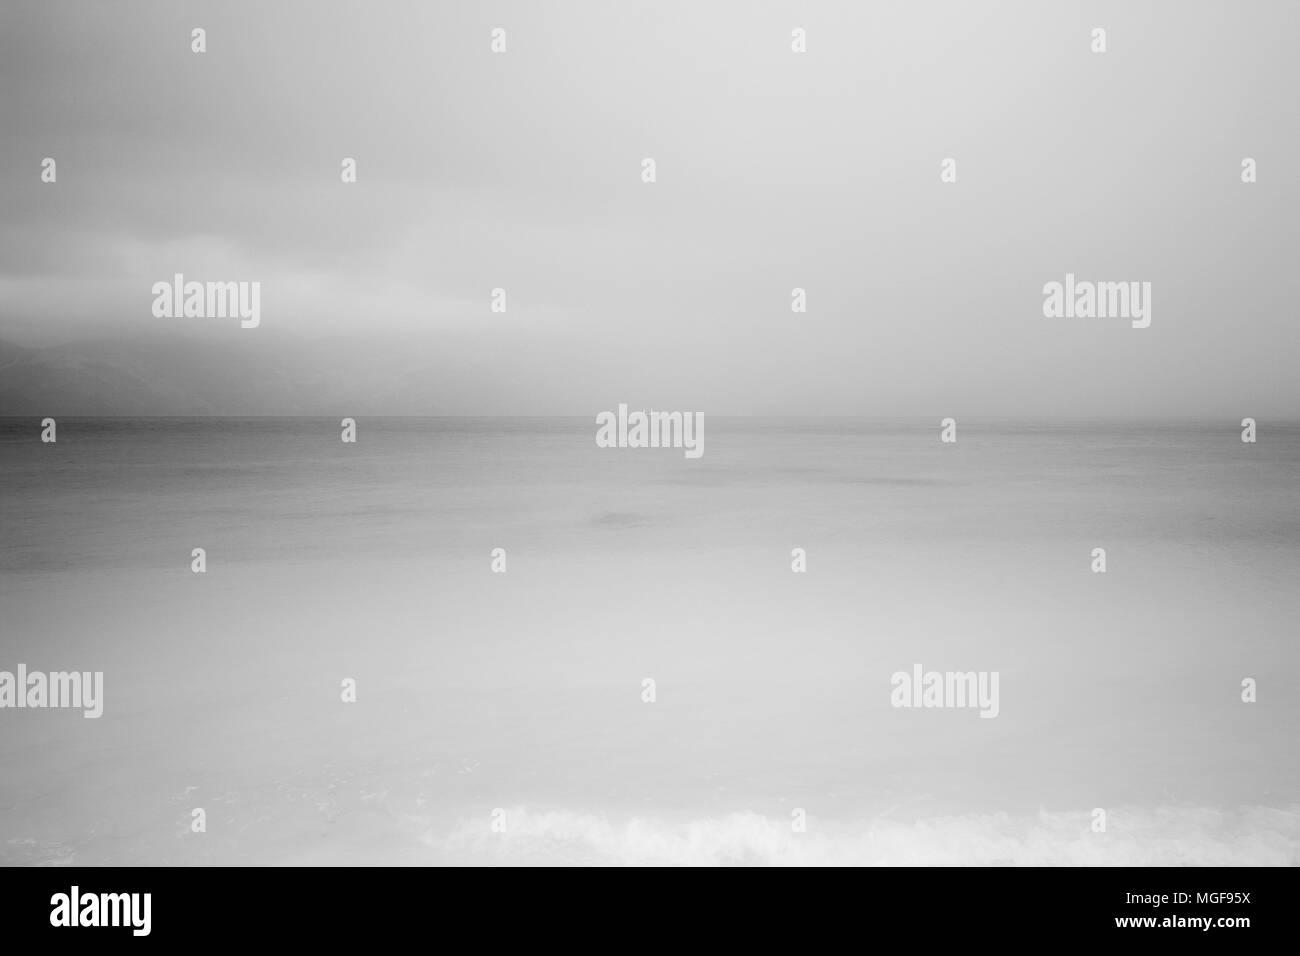 Blured ocean. Gorontalo, Sulawesi. Indonesia - Stock Image